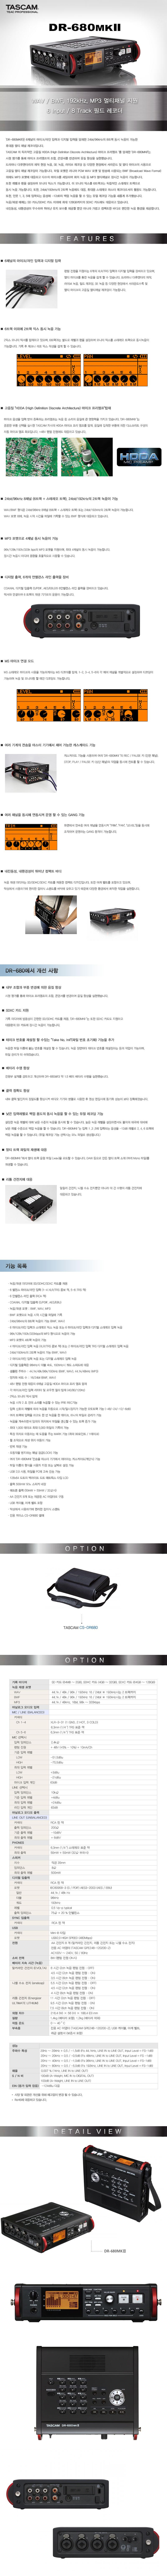 DR-680MK2.jpg